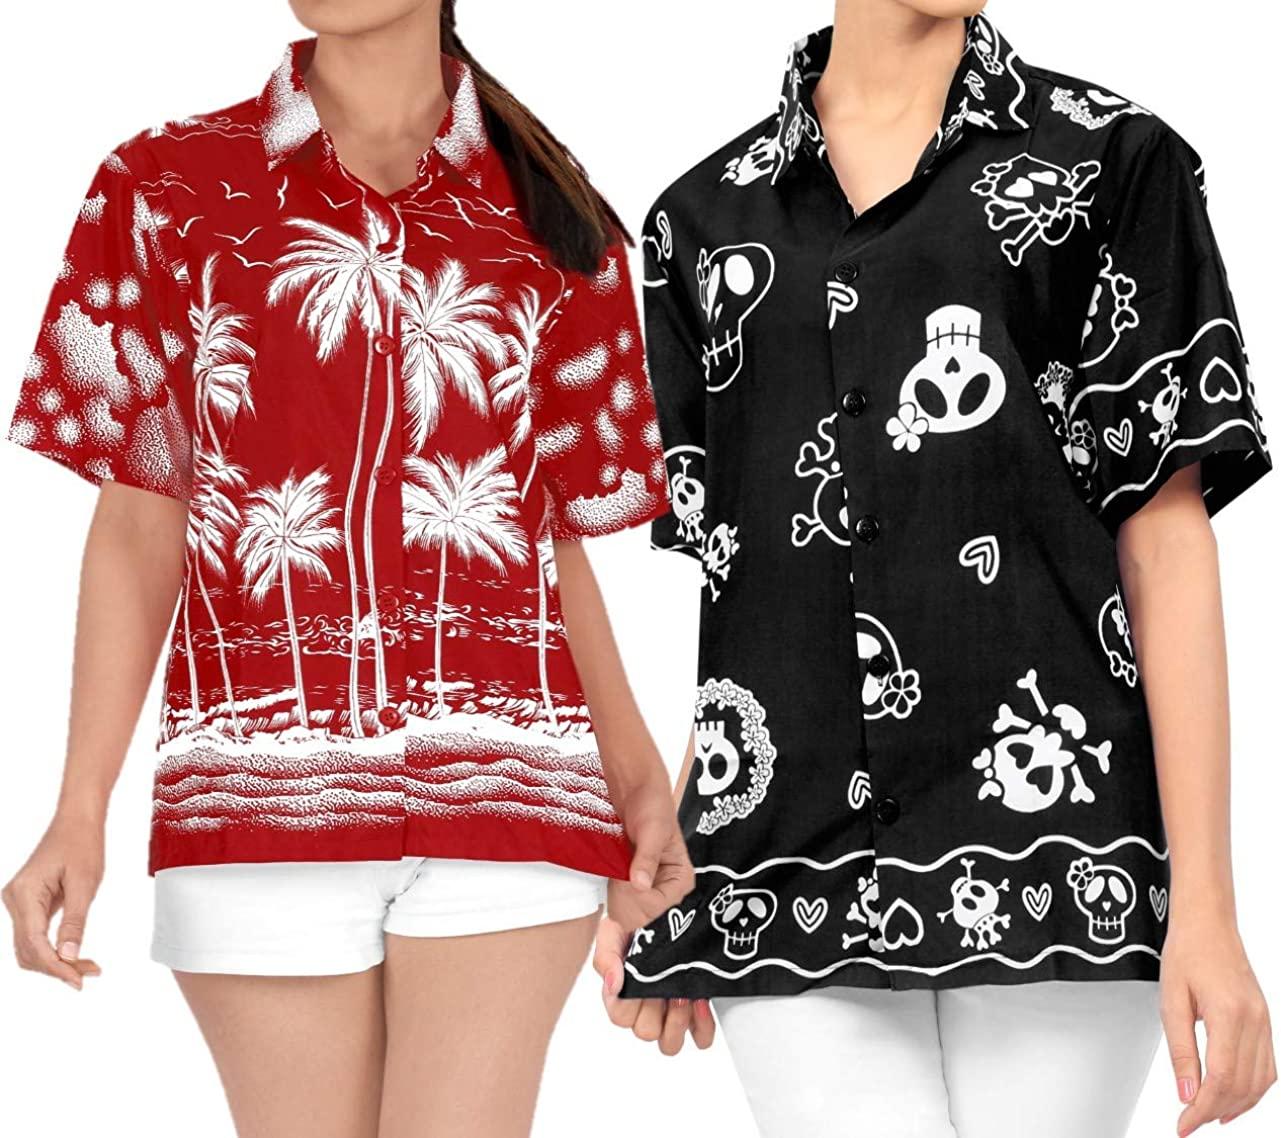 LA LEELA Women's Hawaiian Shirt Vintage Tropical Tunic Tank Shirt Work from Home Clothes Women Beach Shirt Blouse Shirt Combo Pack of 2 Size XXL